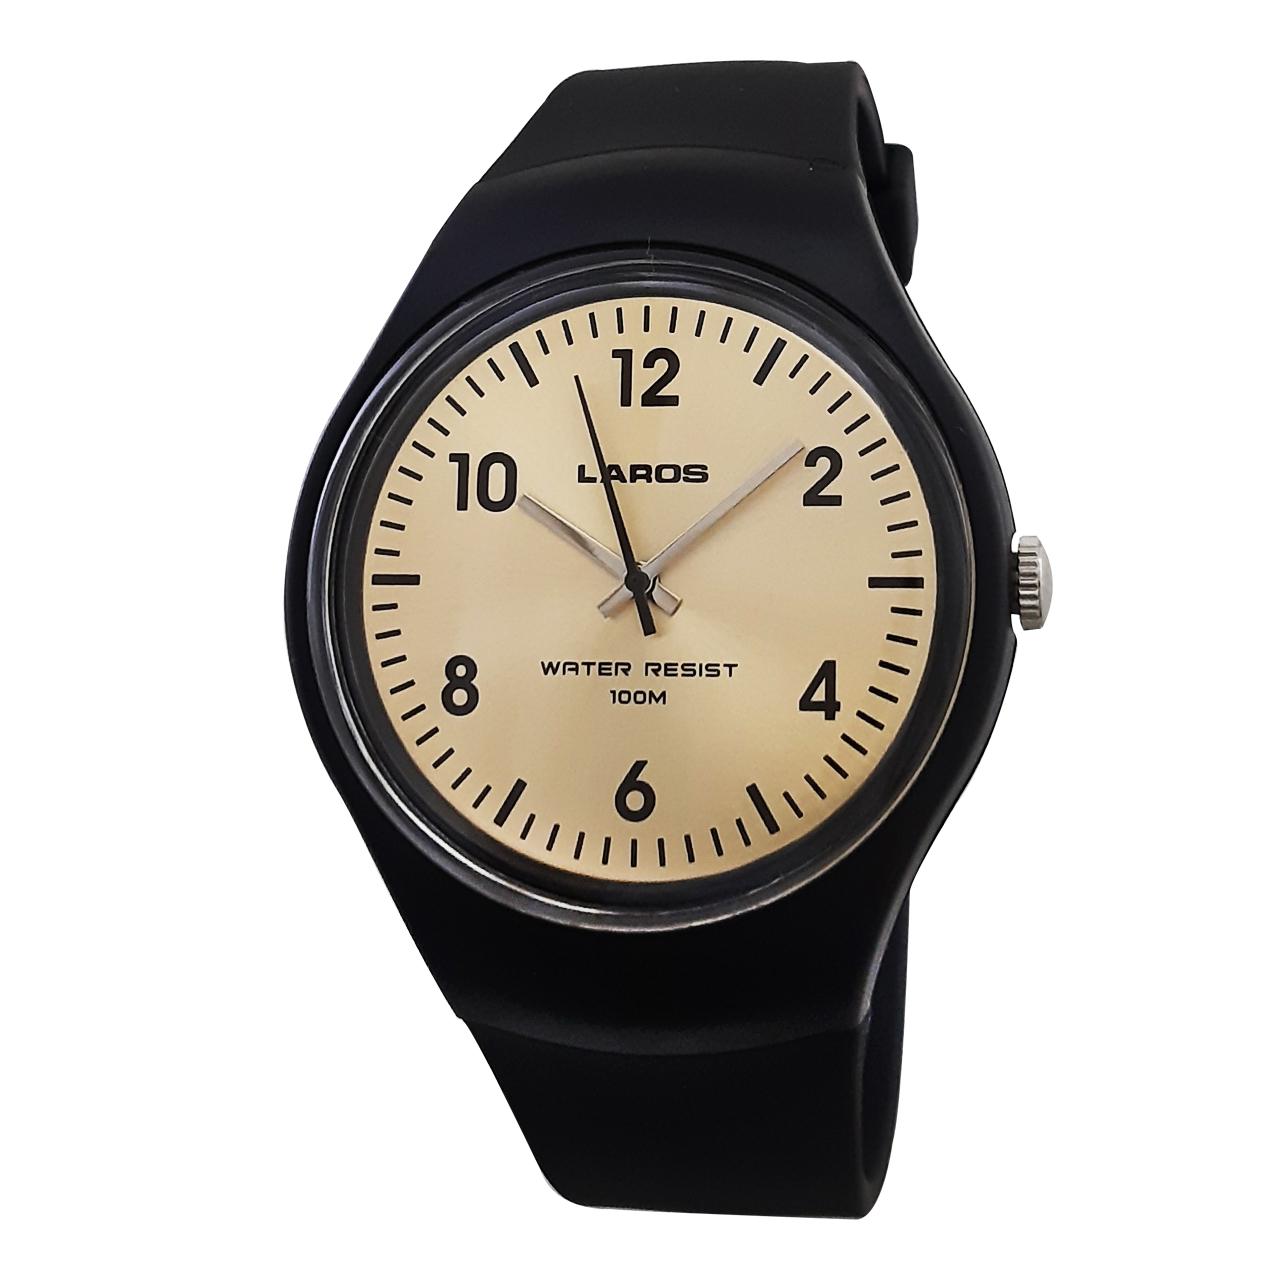 کد تخفیف                                      ساعت مچی عقربه ای لاروس کد 1217-aq1066a